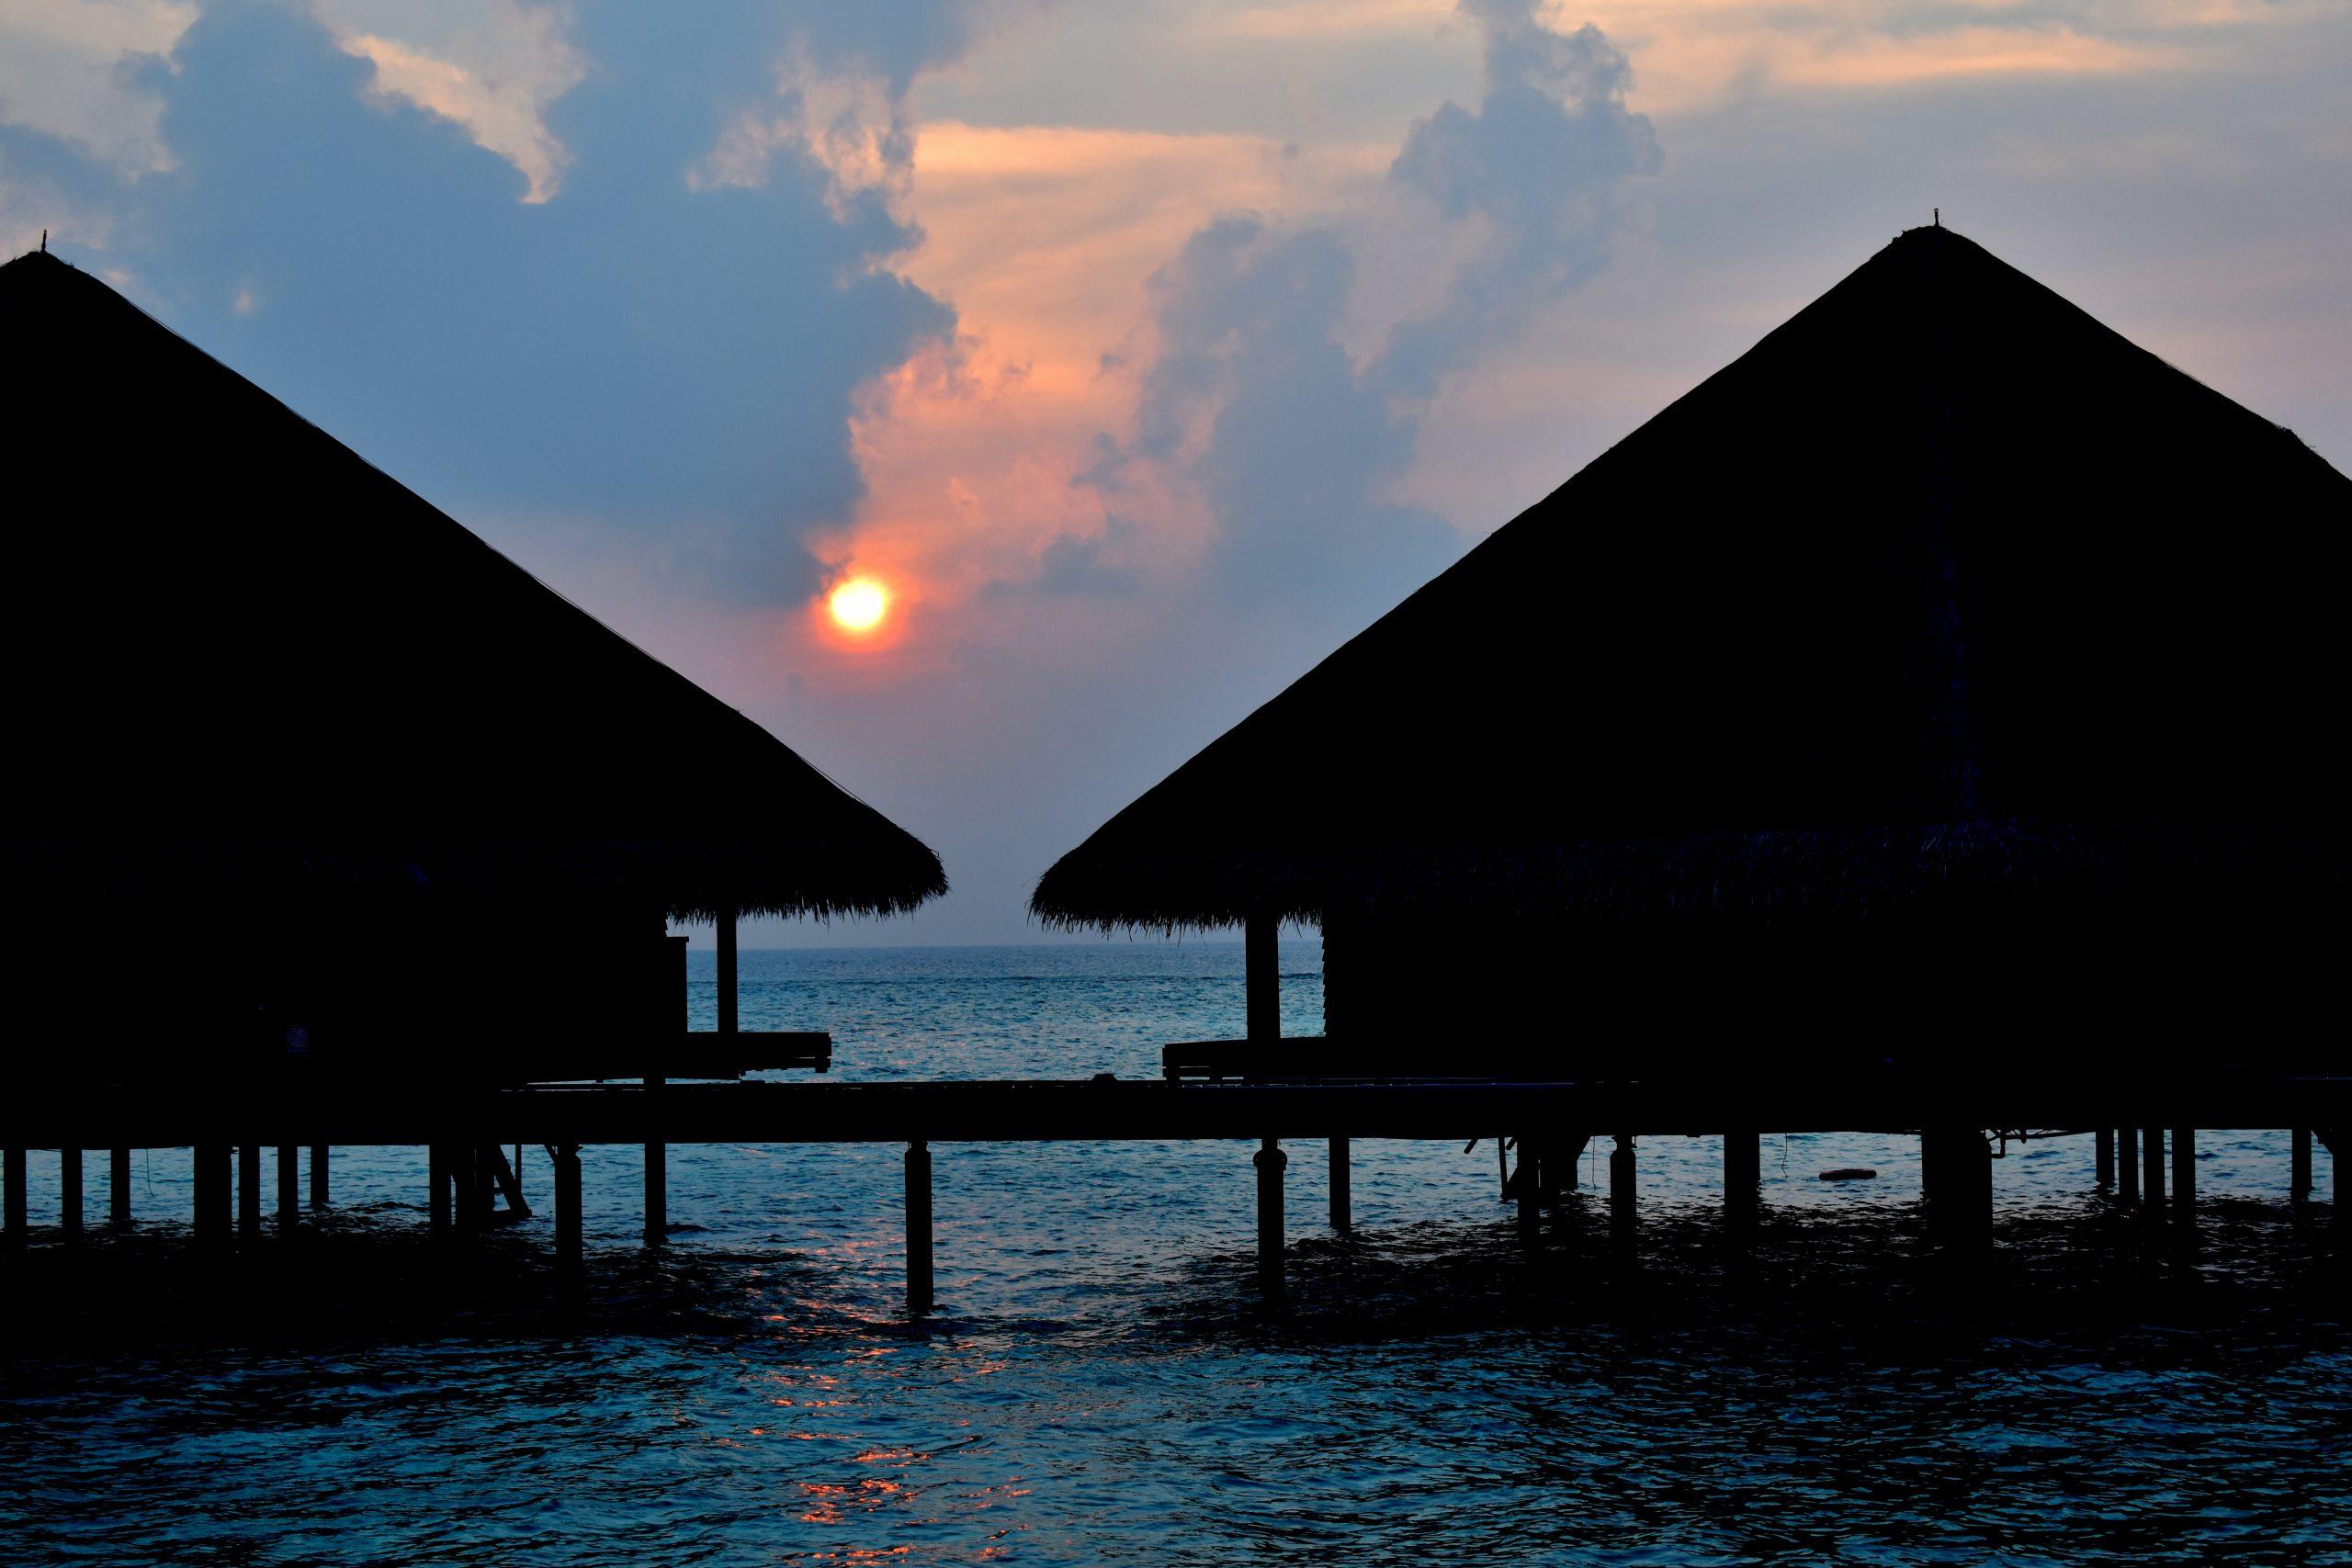 Sunset through a water villa in Maldives